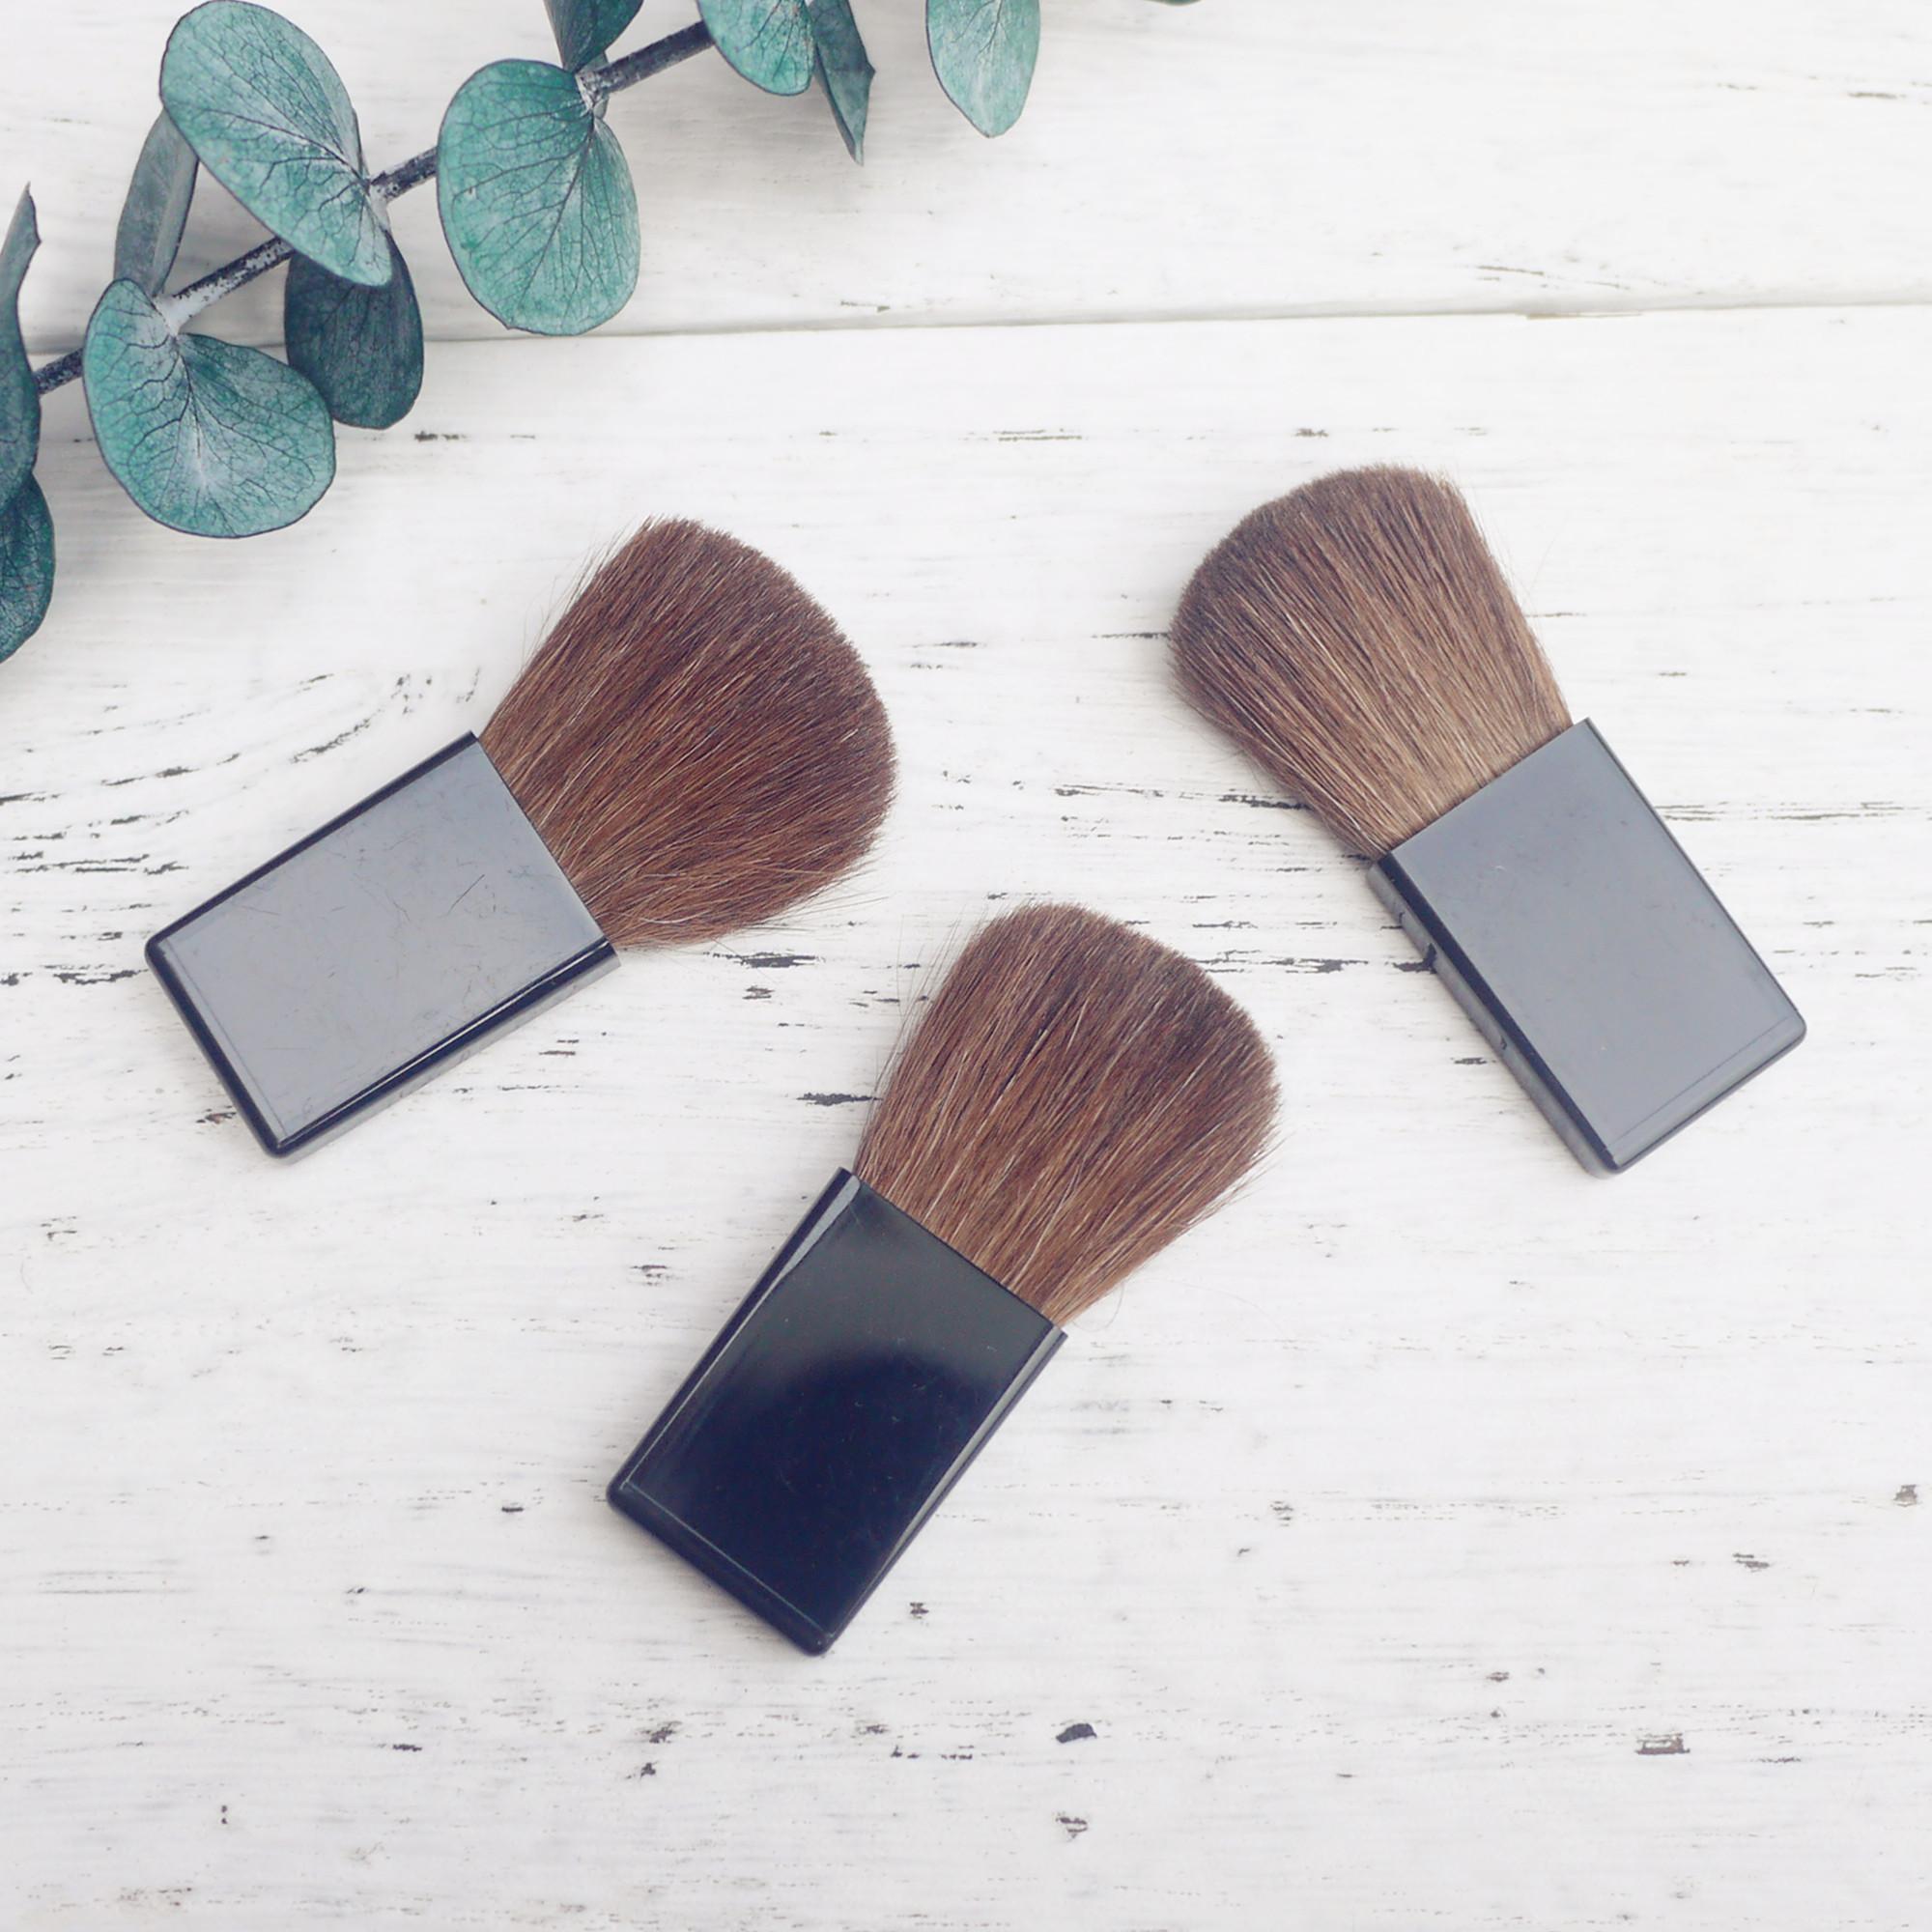 Quality day single professional makeup brush flat head wool blush brush rouge brush powder brush eye shadow brush Foundation Brush 23